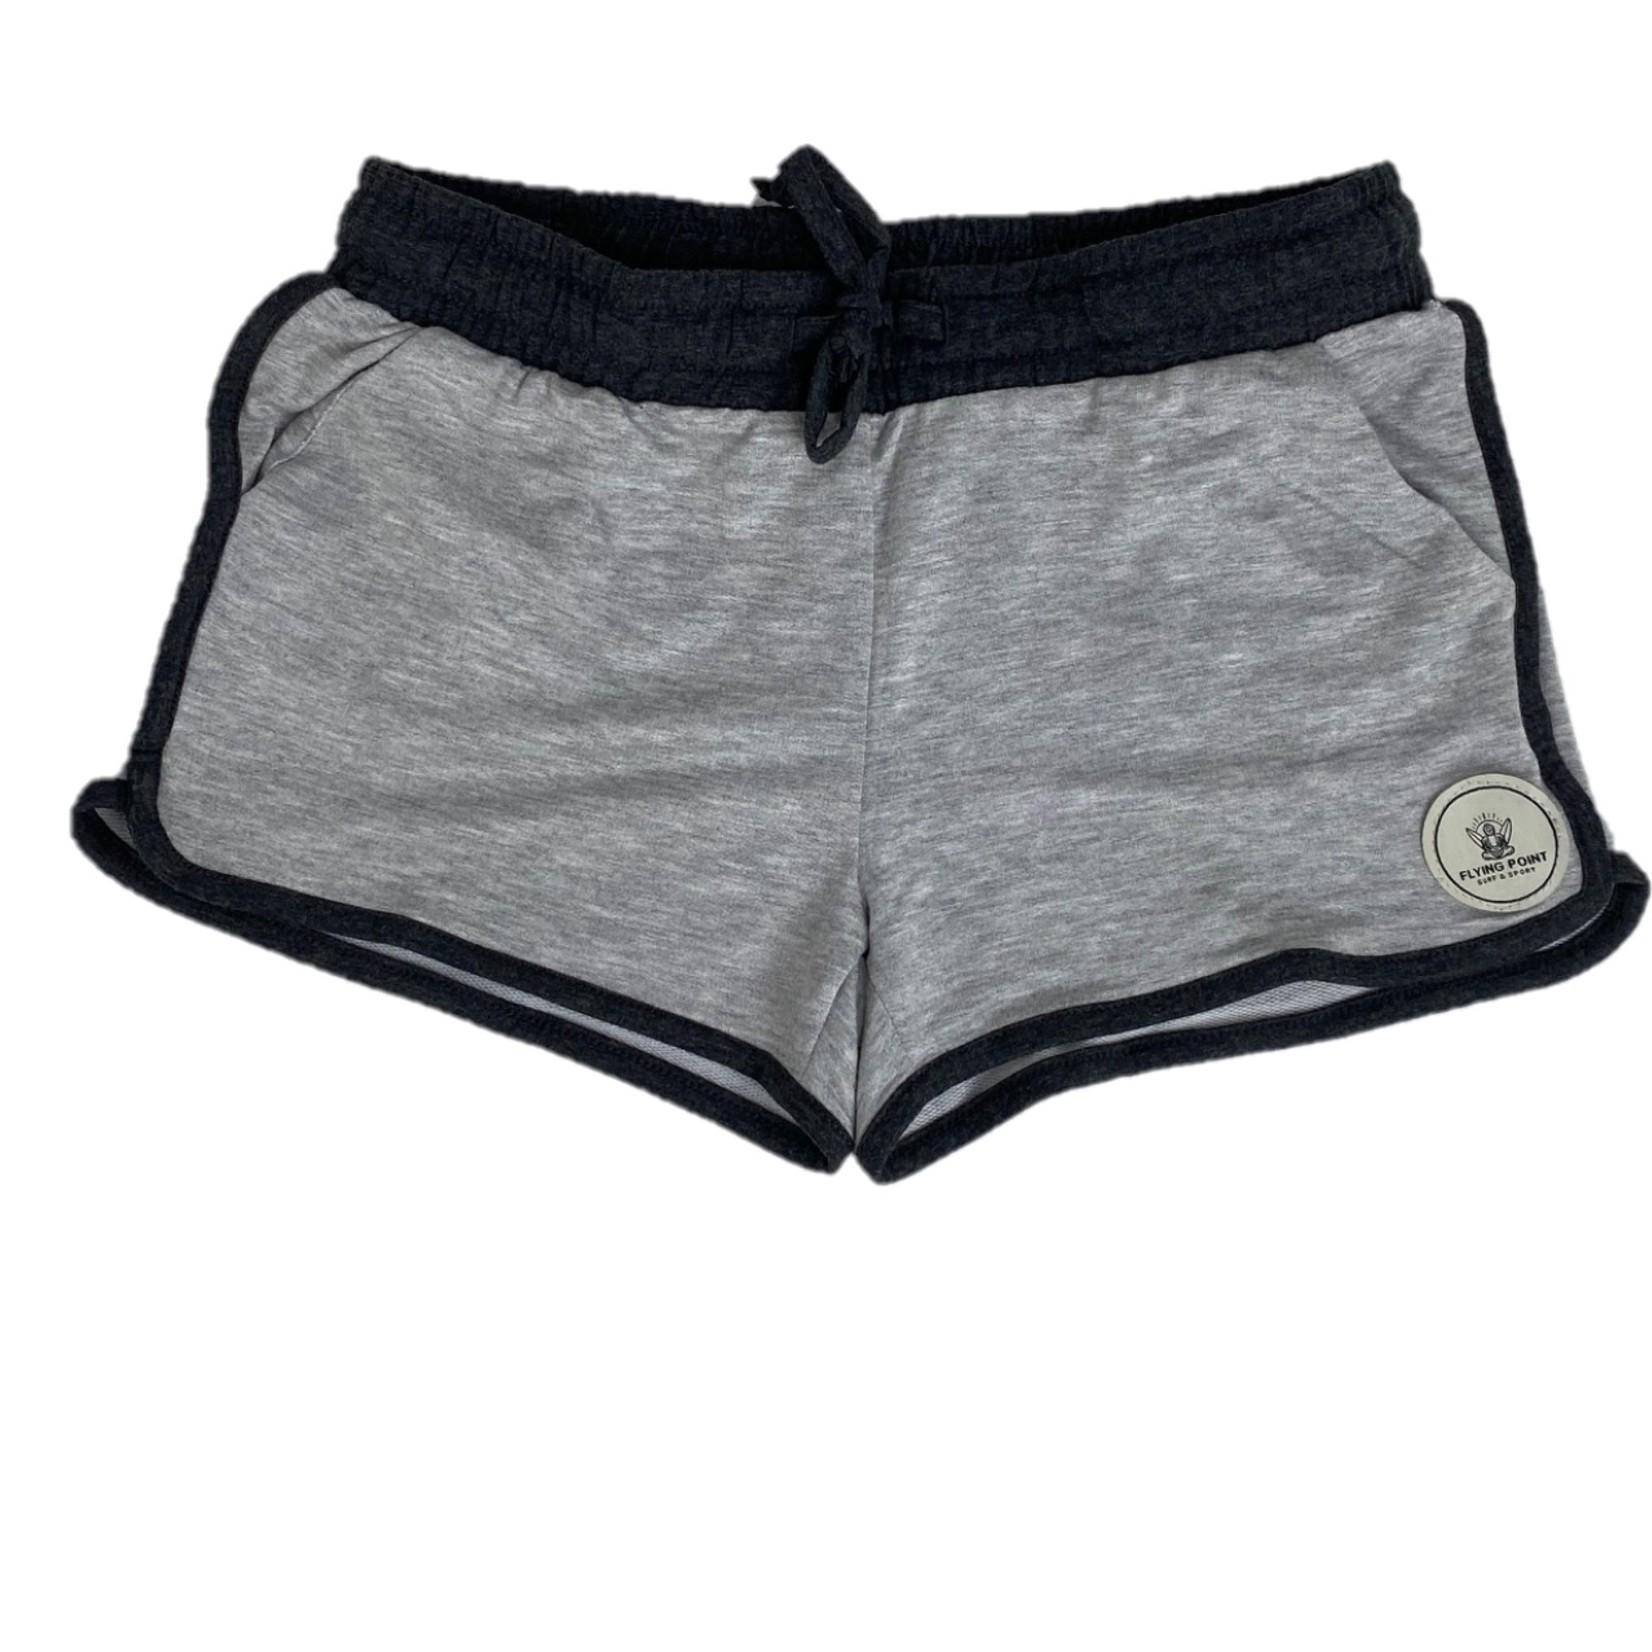 Flying Point Chillaxin Shorts